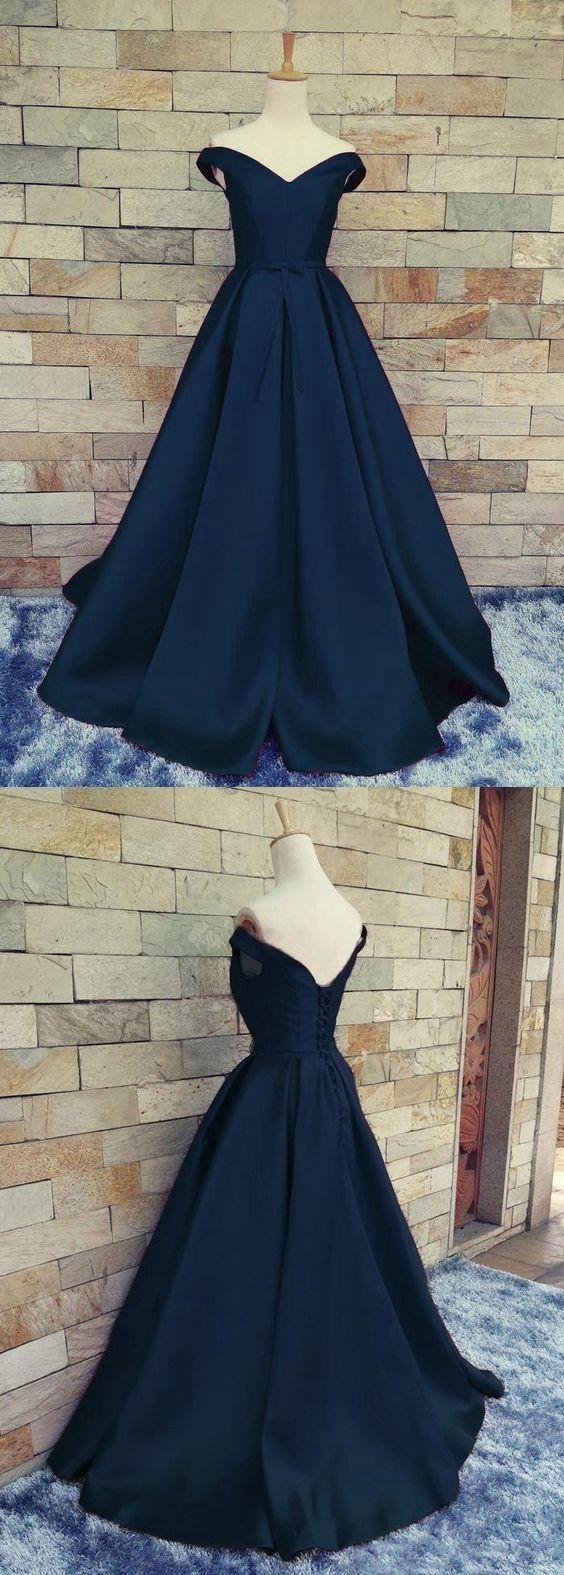 Navy blue prom dressball gown prom dresslong prom dressoff